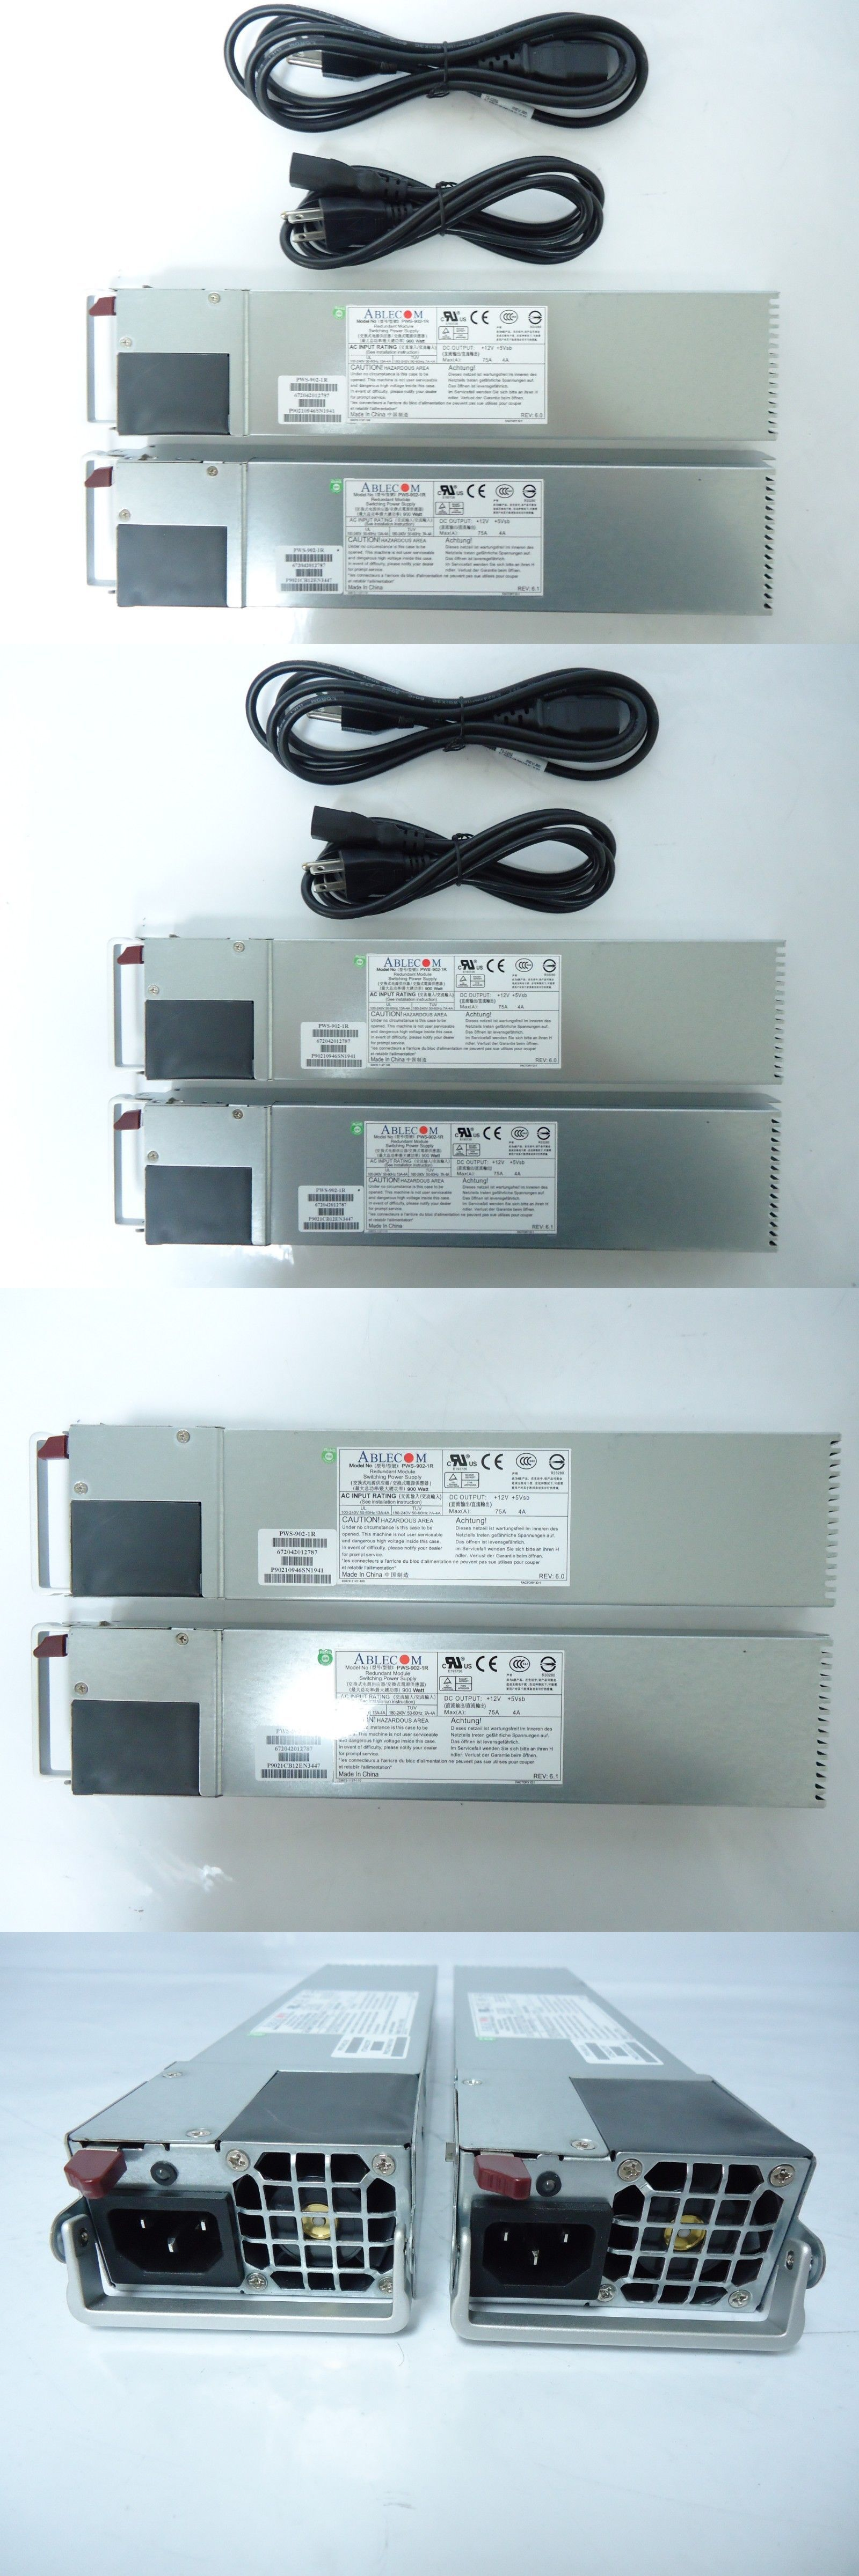 Server Power Supplies 56090 Lot Of 2 New Supermicro Pws 902 1r 900w 1u Server Psu Redundant Power Supply Buy It Now Only 48 On Ebay S Server Power Ebay